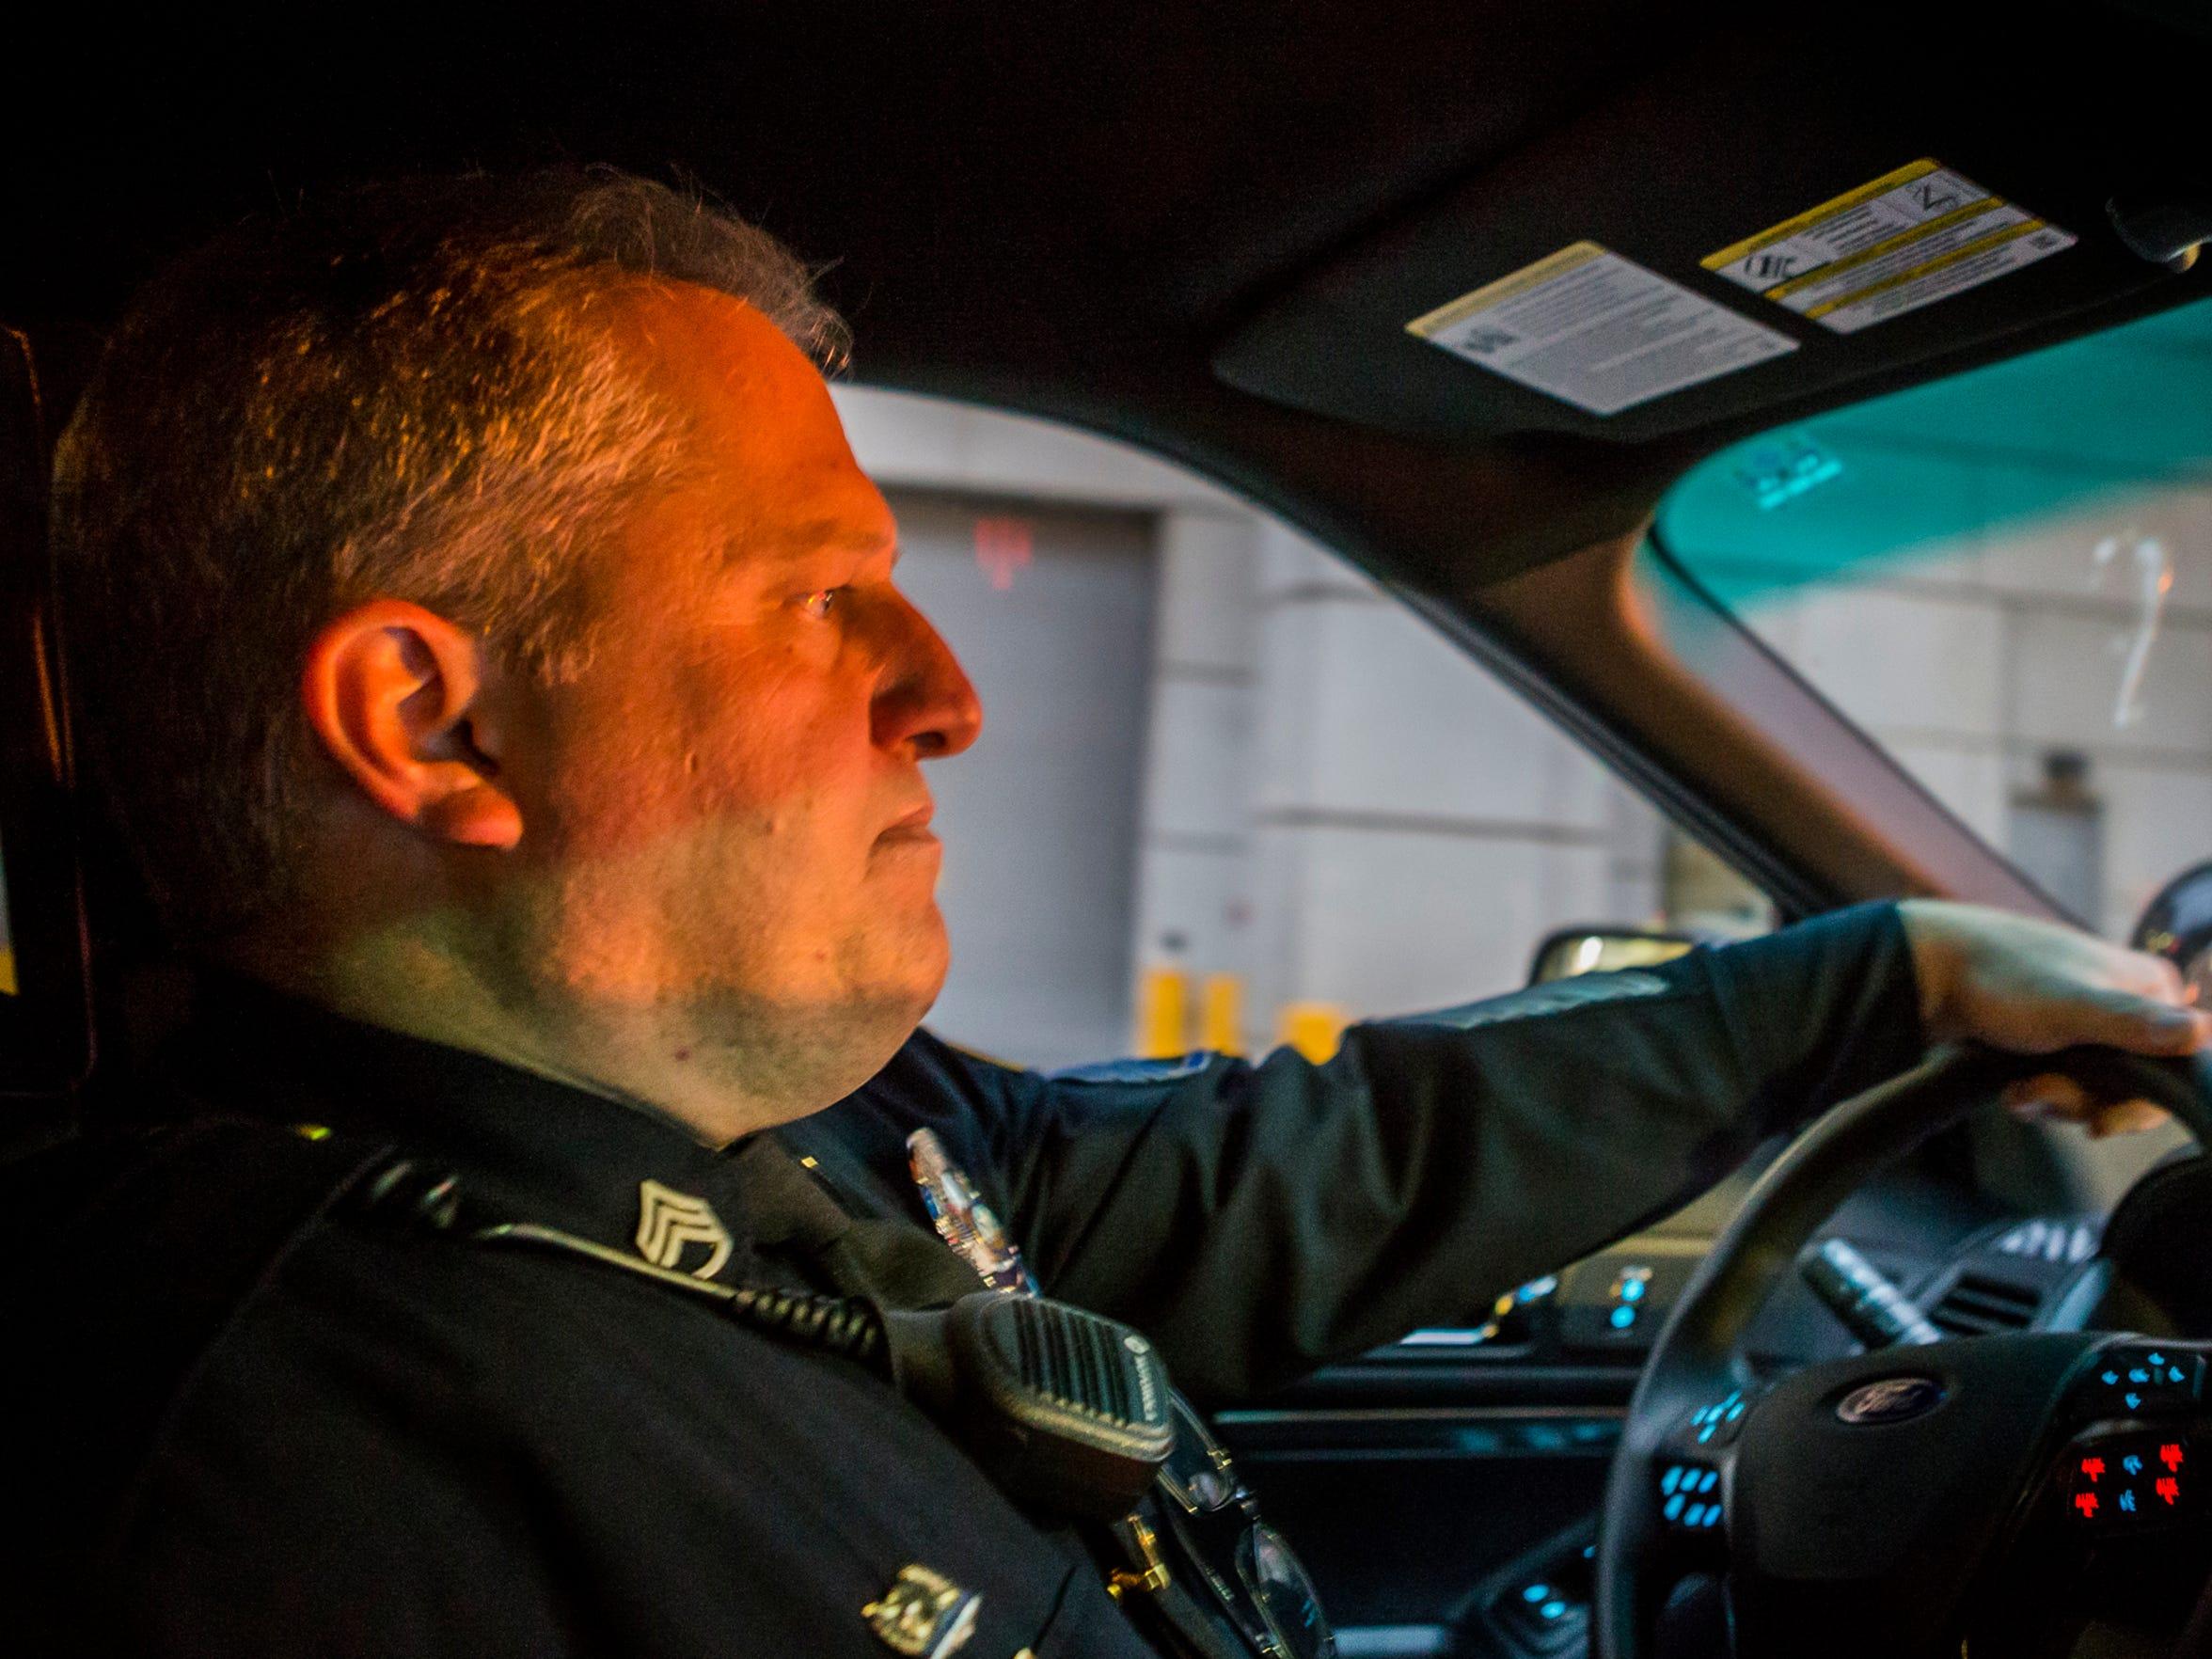 Then-Sgt. Bill Schmid, of the Wilmington Police Department,